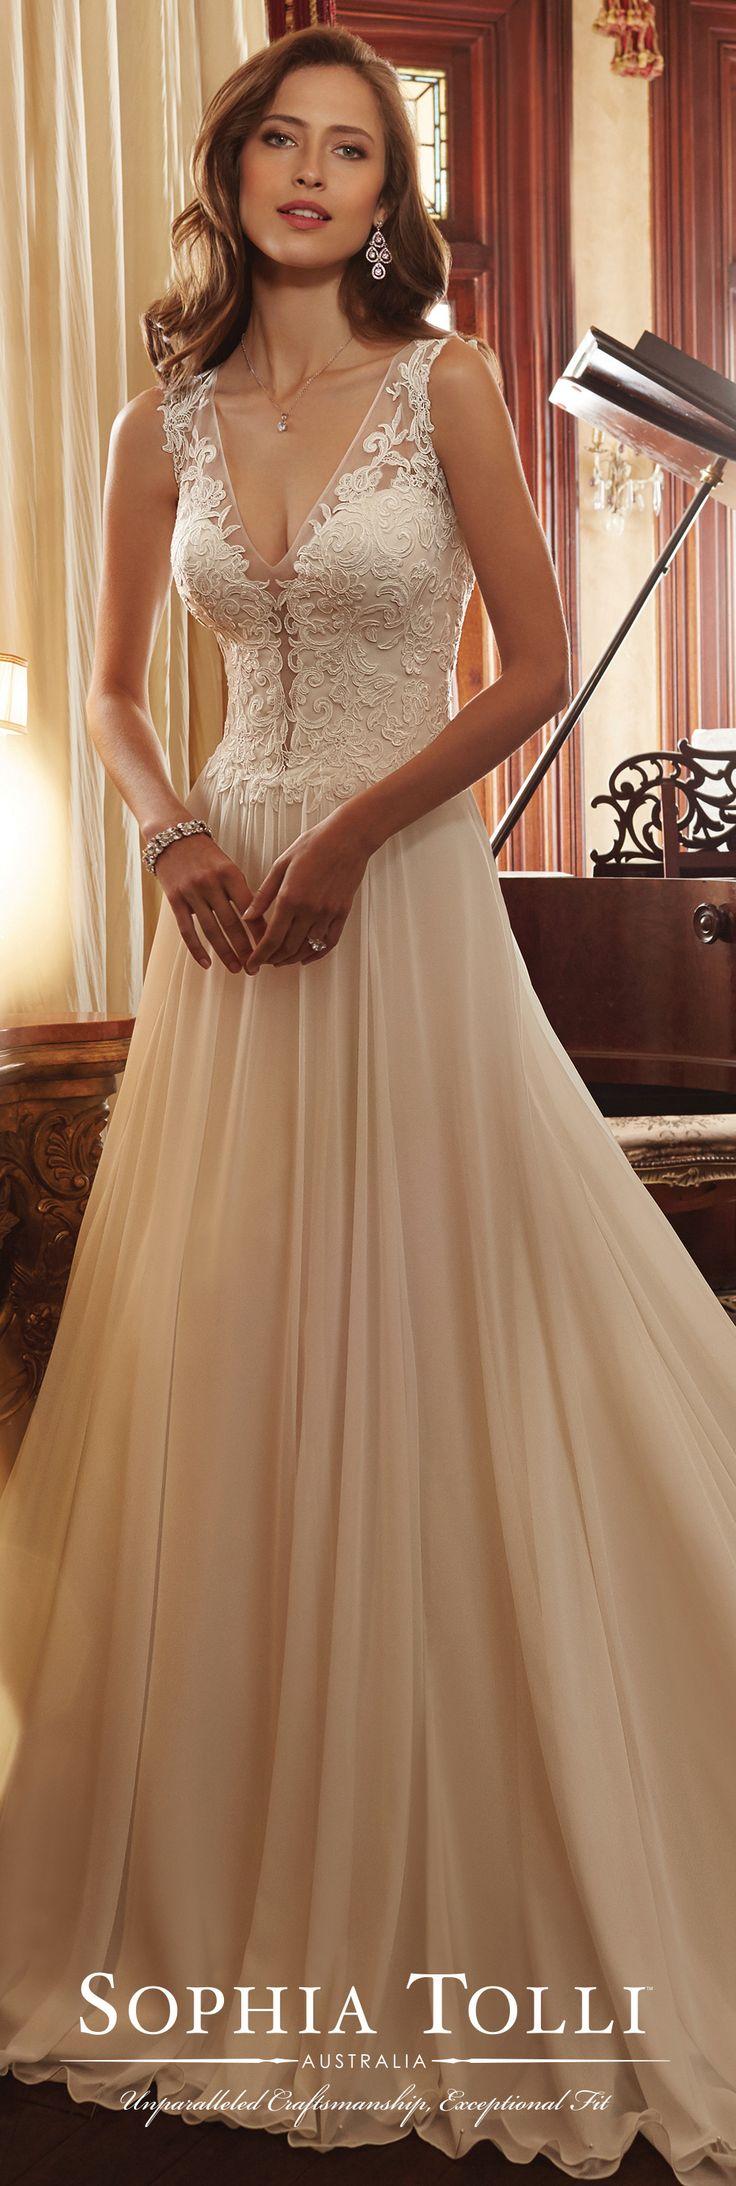 best pretty dresses images on pinterest wedding frocks